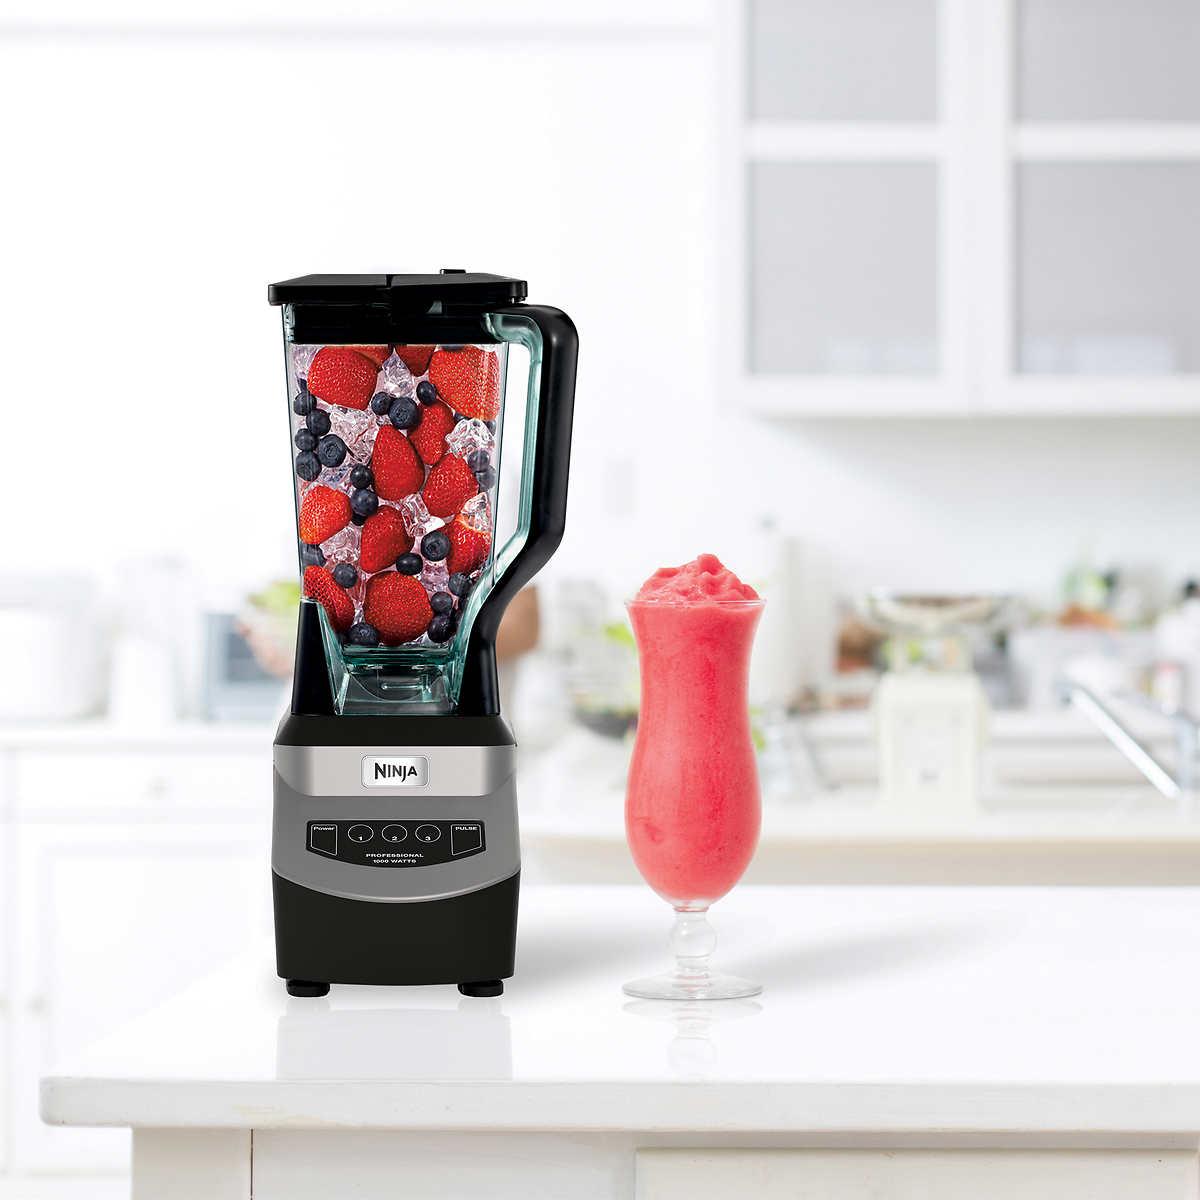 Ninja mega kitchen system 1500w 2hp food processor blender bl773co - Member Only Item Ninja Professional 1000 Watt Blender